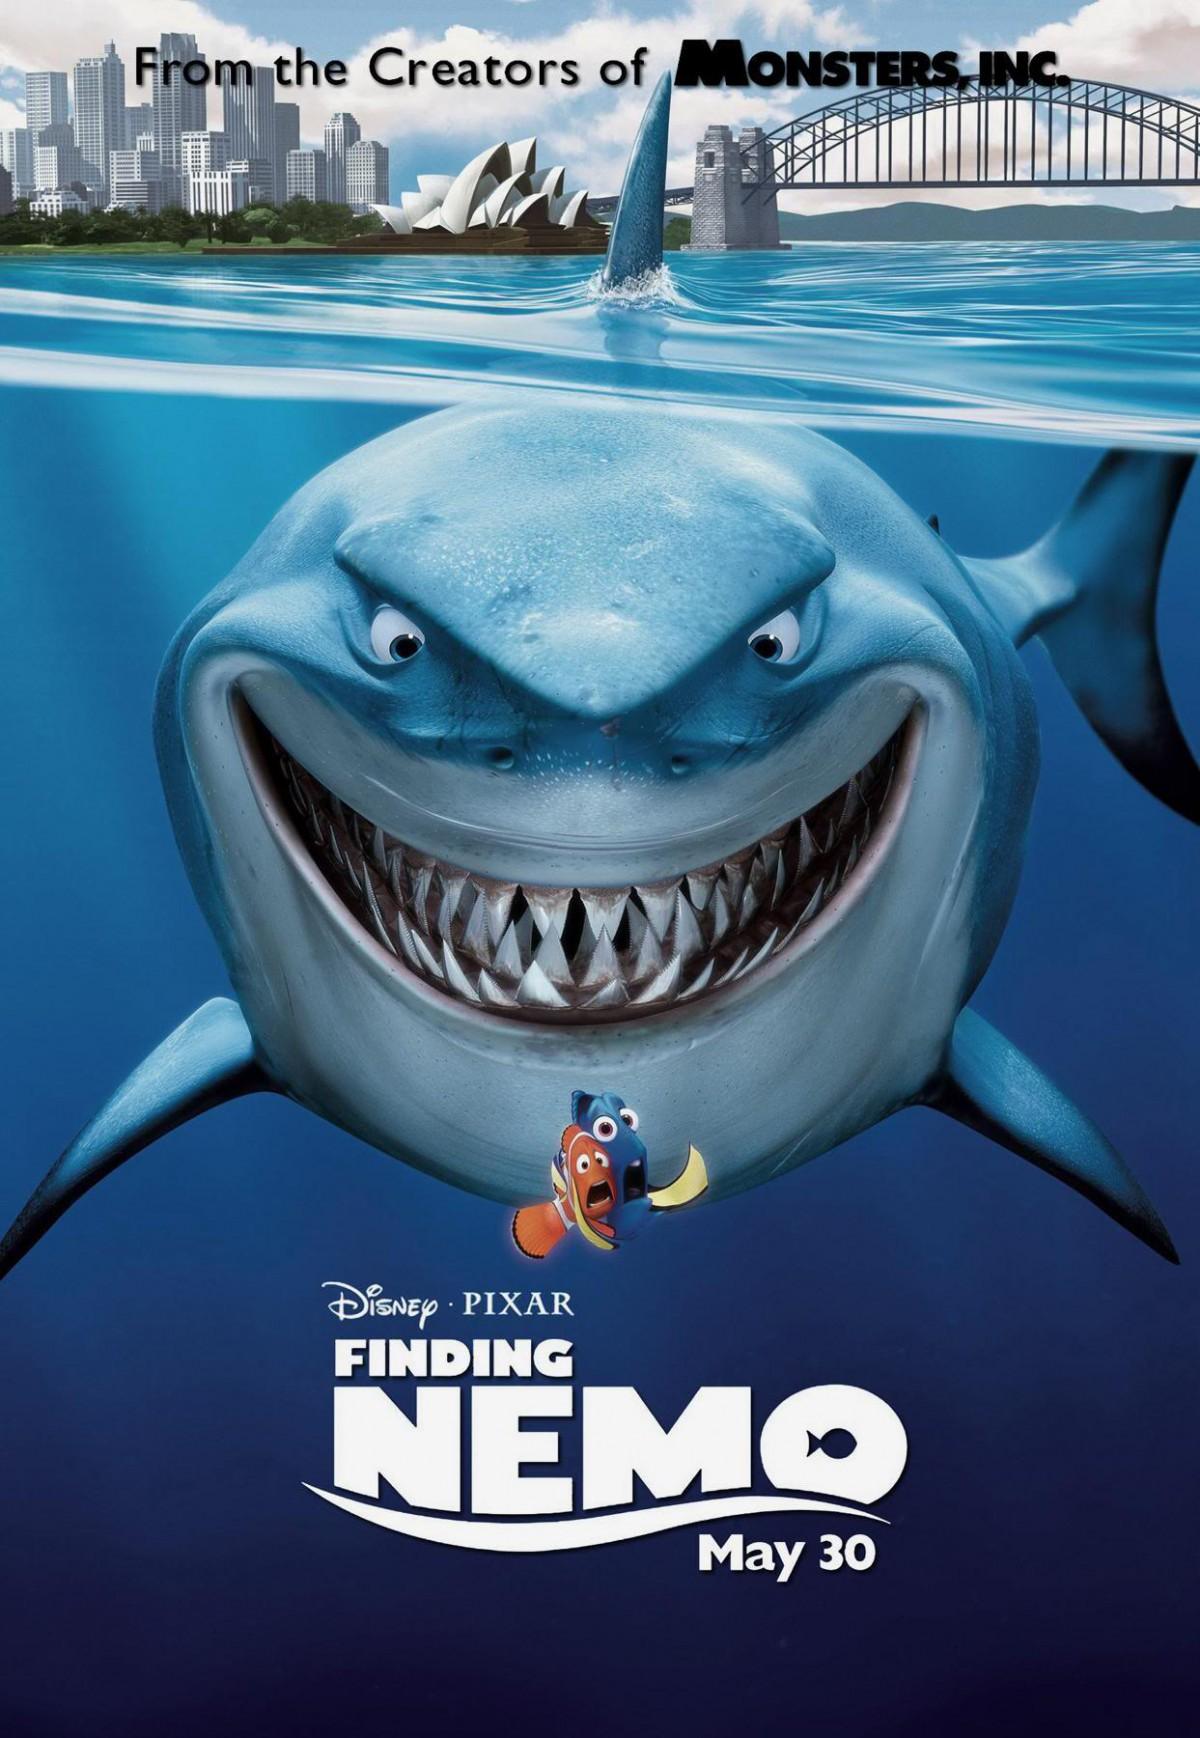 94. Finding Nemo (2003)